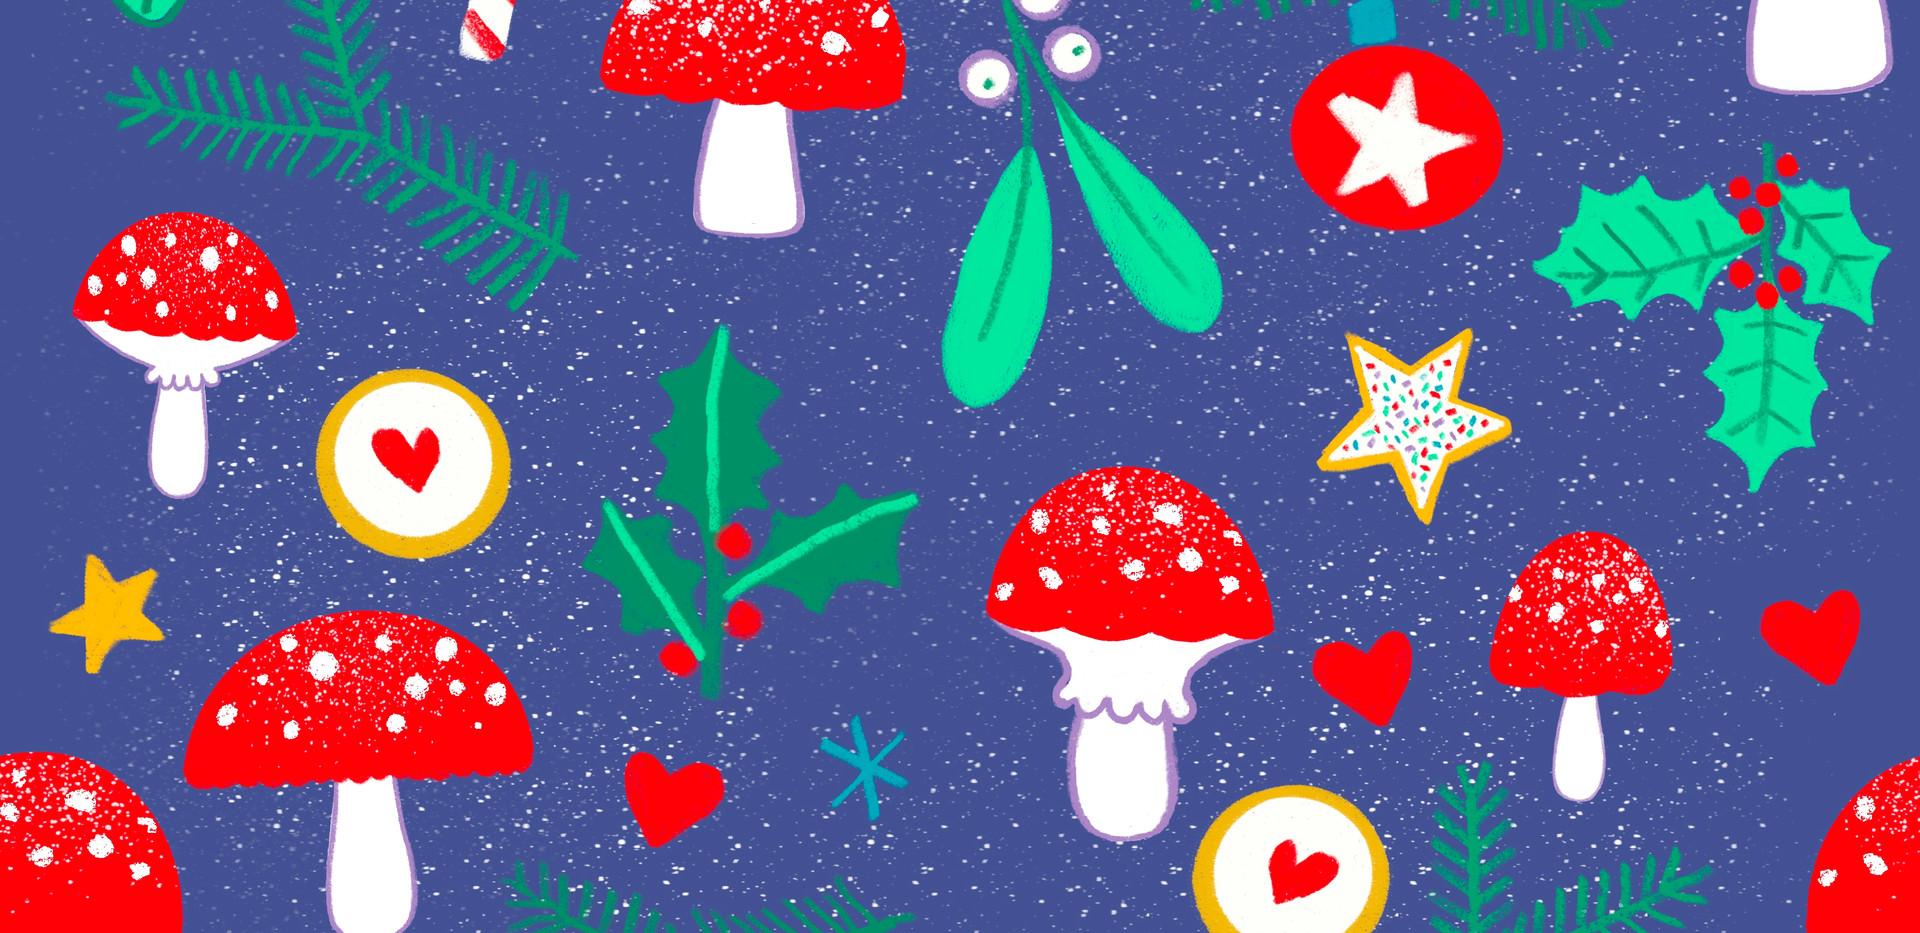 Mushroom Christmas